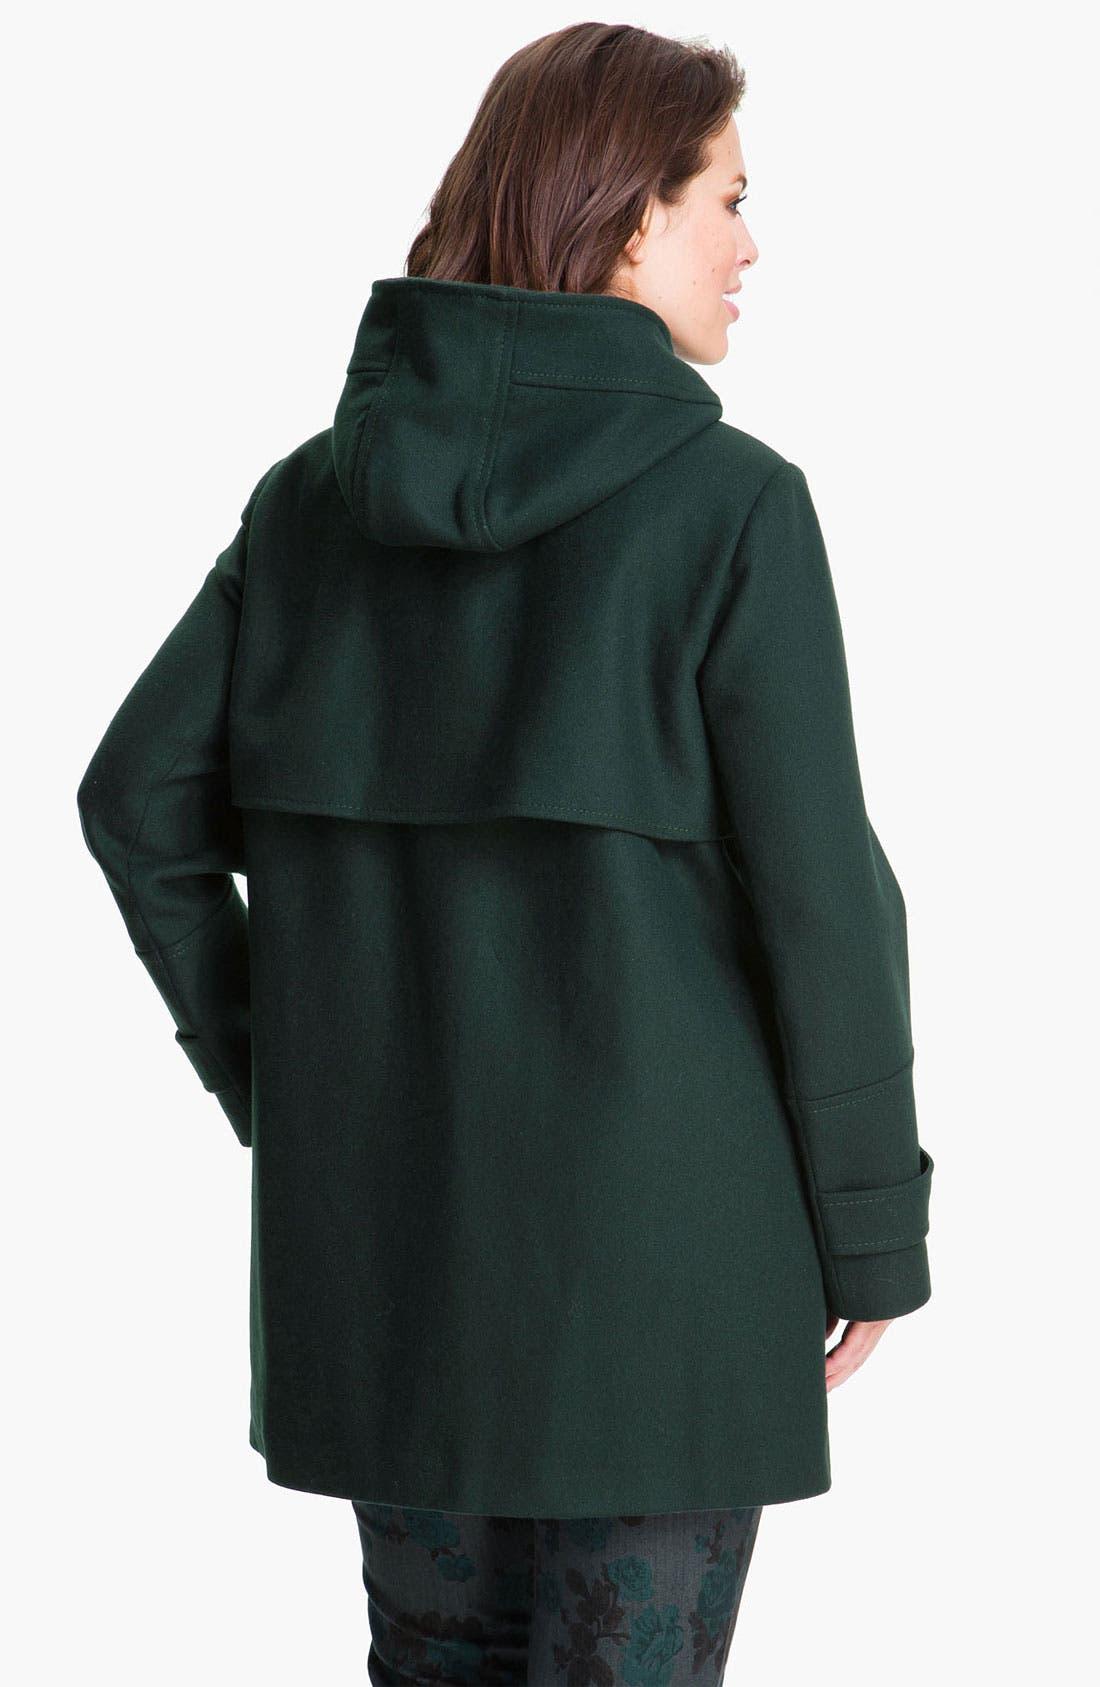 Wool Blend Jacket with Detachable Hood,                             Alternate thumbnail 3, color,                             300